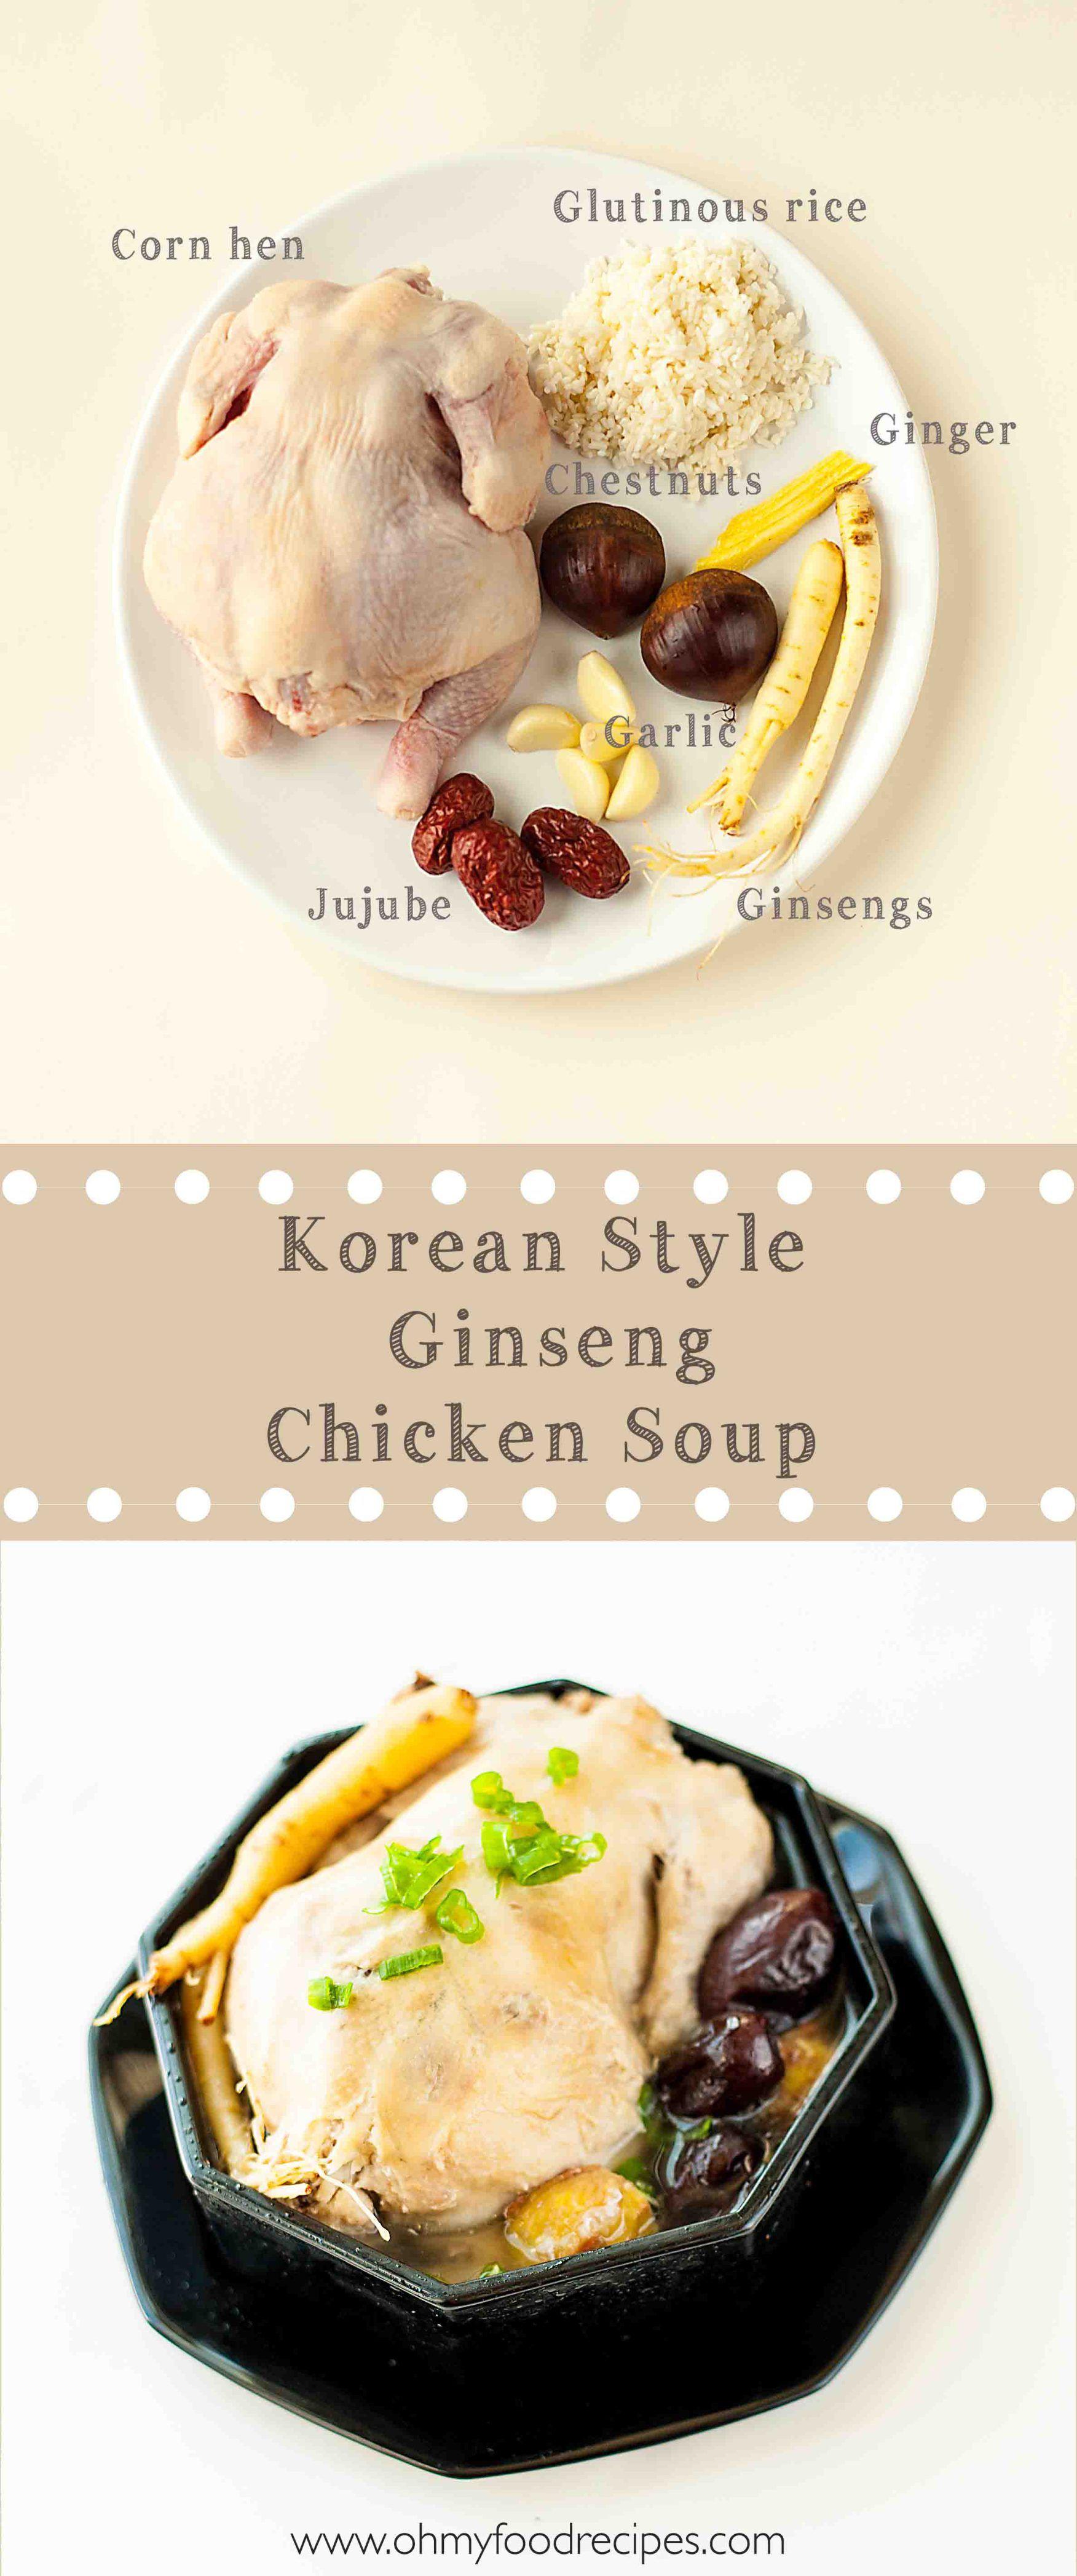 Korean Style Ginseng Chicken Soup --Instant Pot recipe ginseng soup Korea